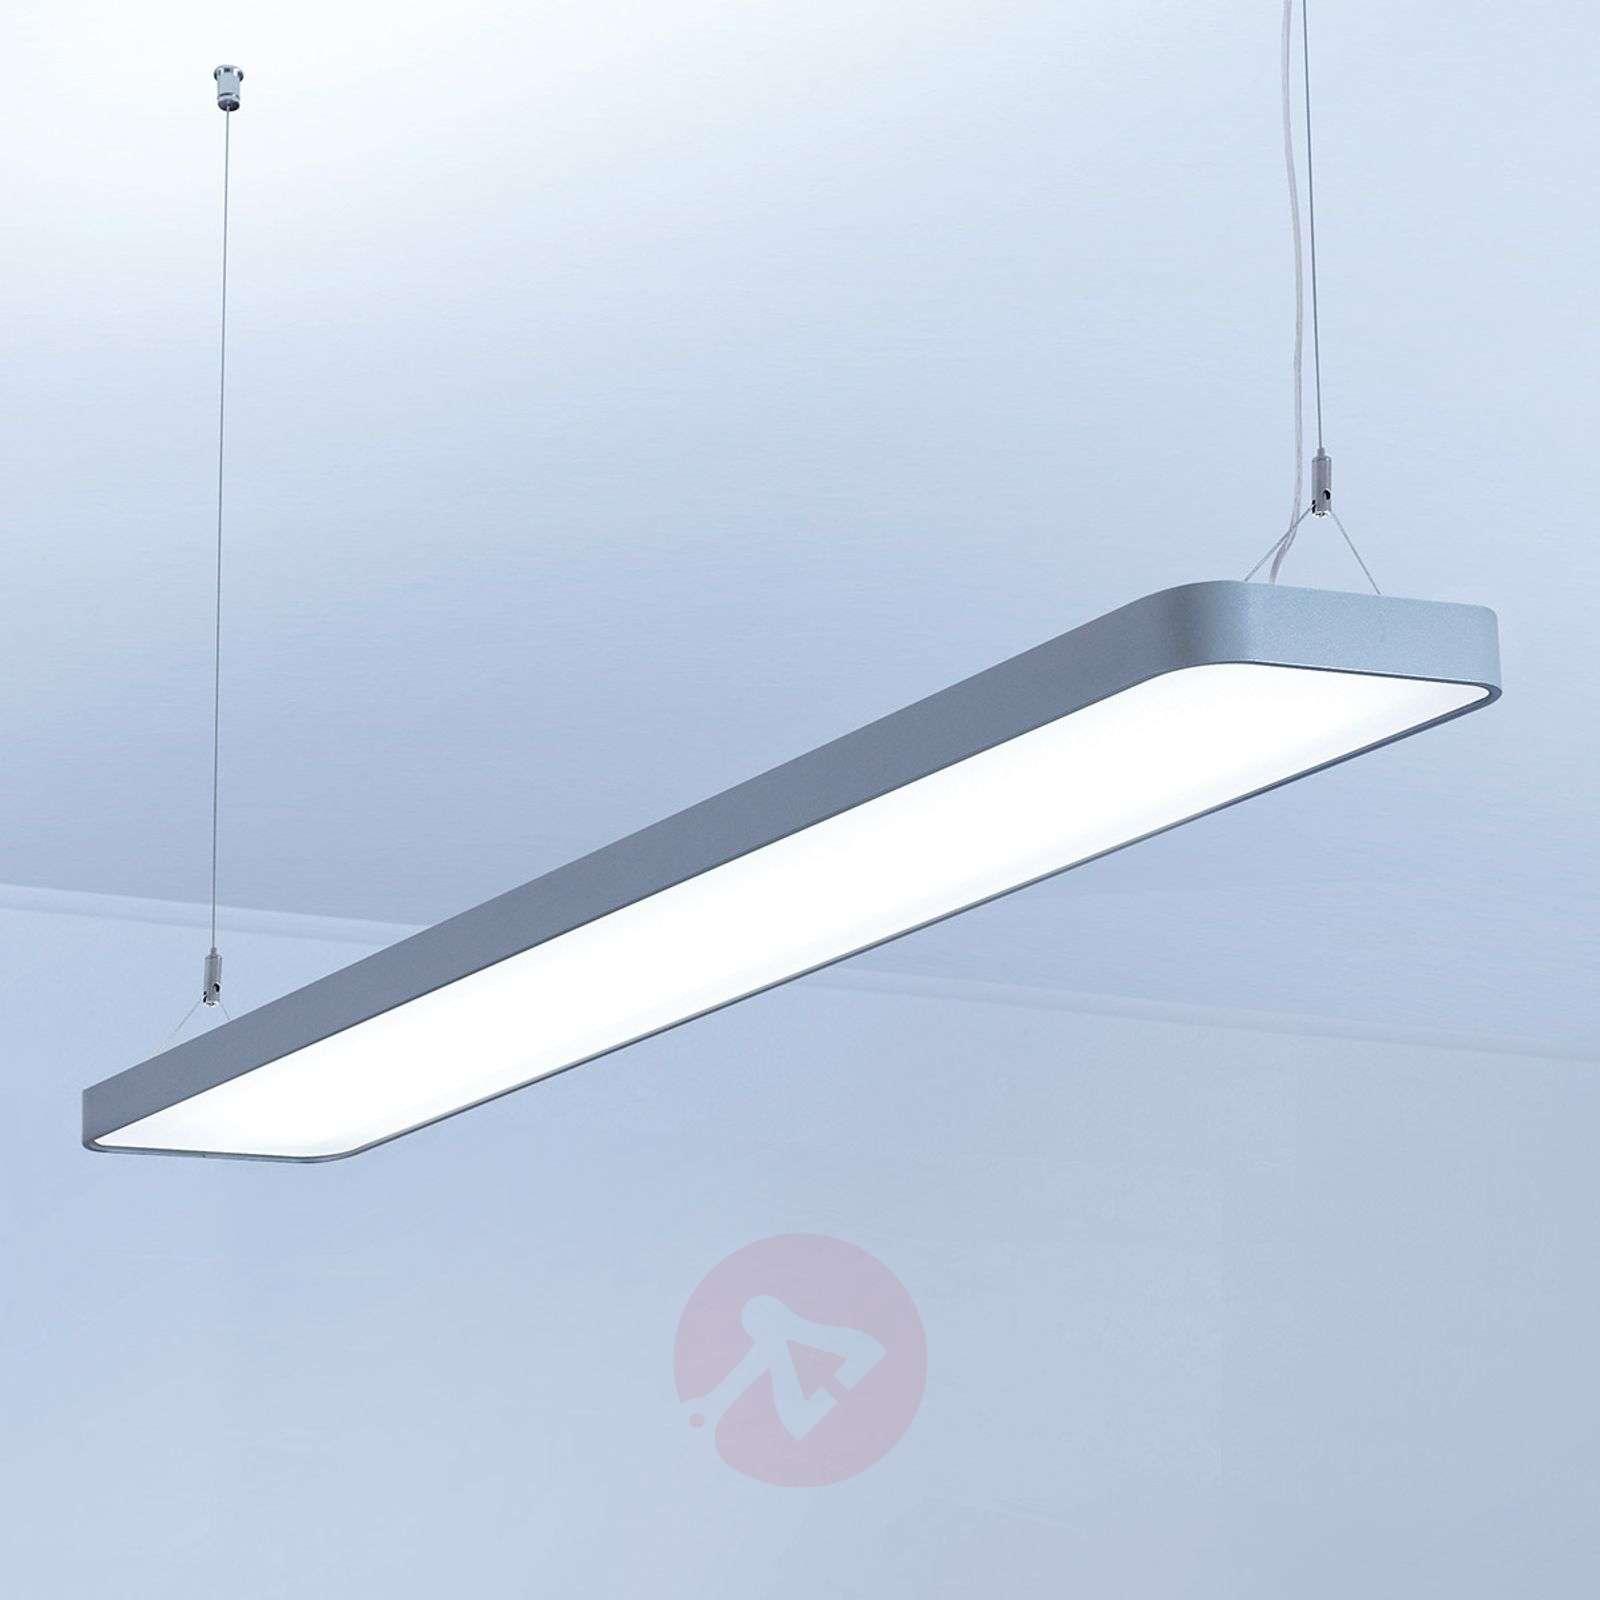 Mainio toimiston LED-riippuvalaisin Caleo-P1-6033448X-01